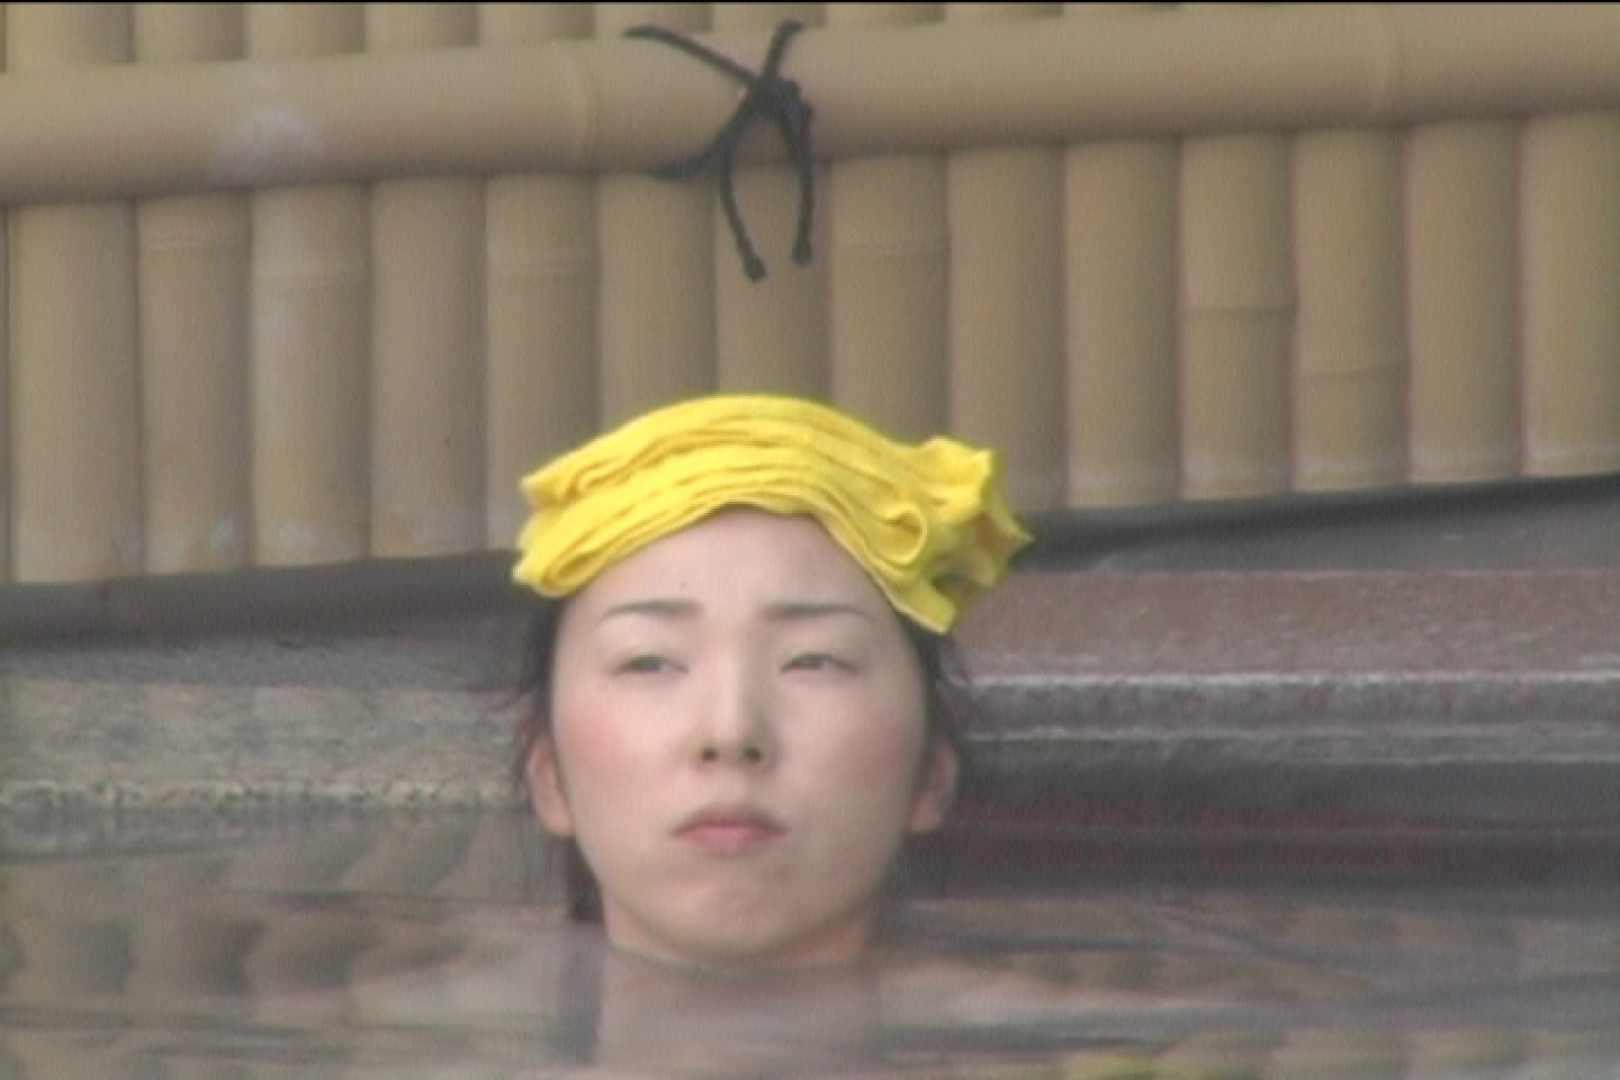 Aquaな露天風呂Vol.529 盗撮シリーズ | 露天風呂編  106PIX 105